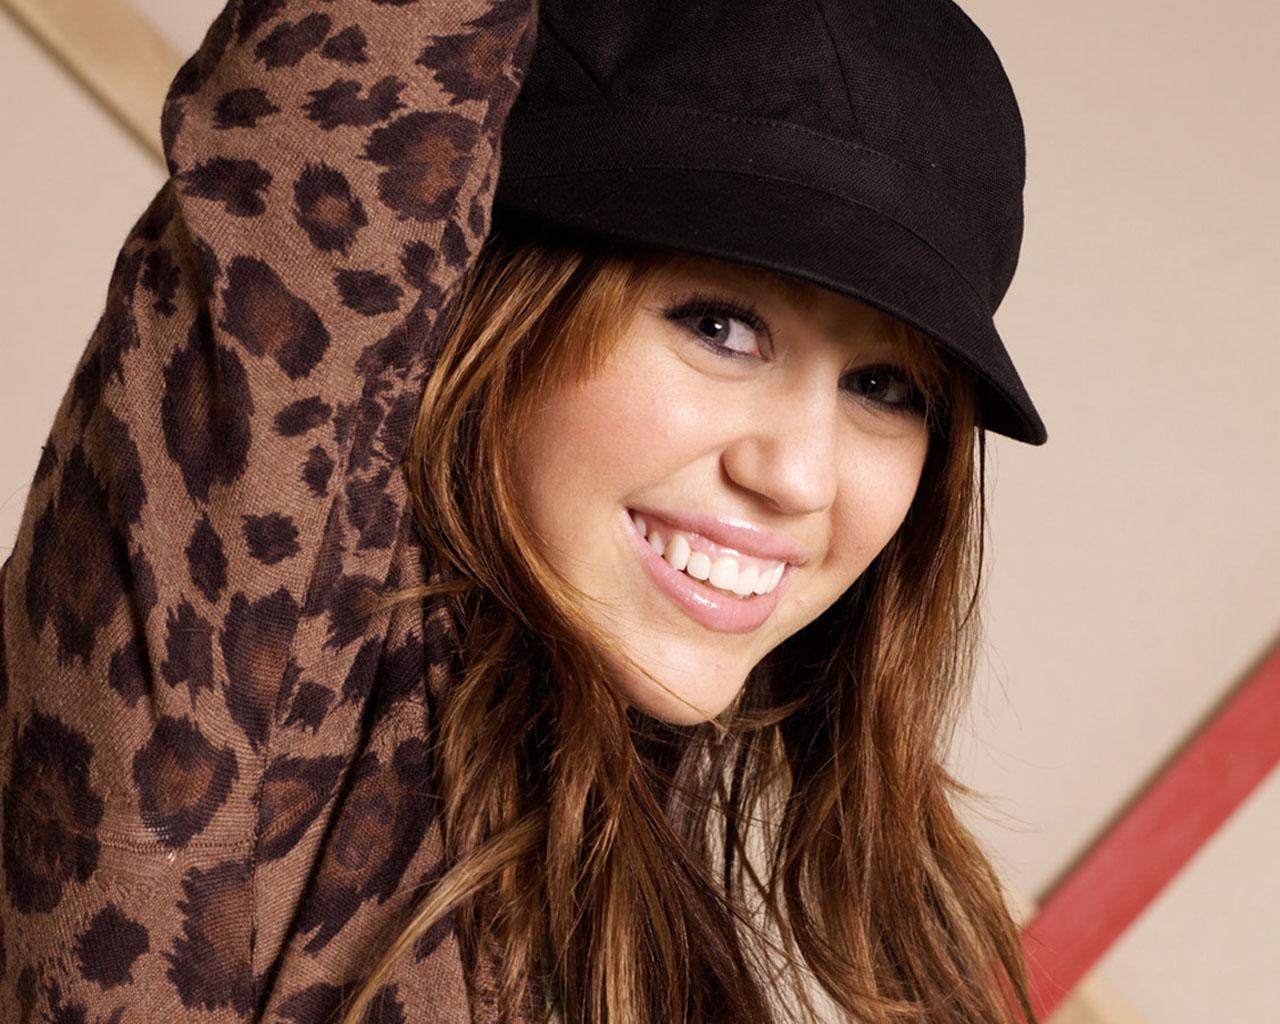 http://2.bp.blogspot.com/-BnMFGCP3oLE/TxX5gV-oFhI/AAAAAAAAHhk/TT82dh63MVk/s1600/fotos-Miley+-Cyrus+-fotos+%252810%2529.jpg